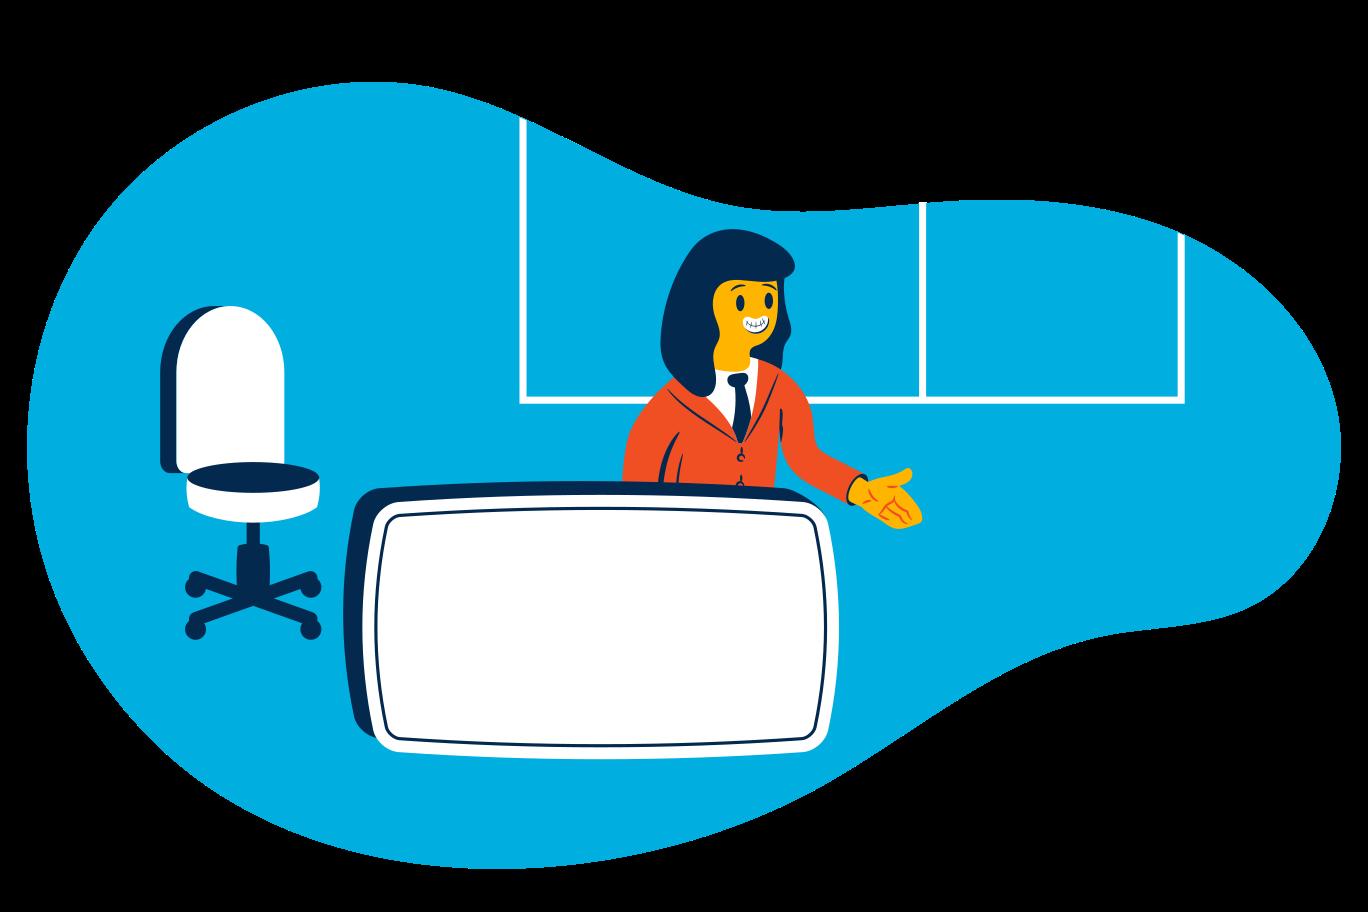 Reception Clipart illustration in PNG, SVG